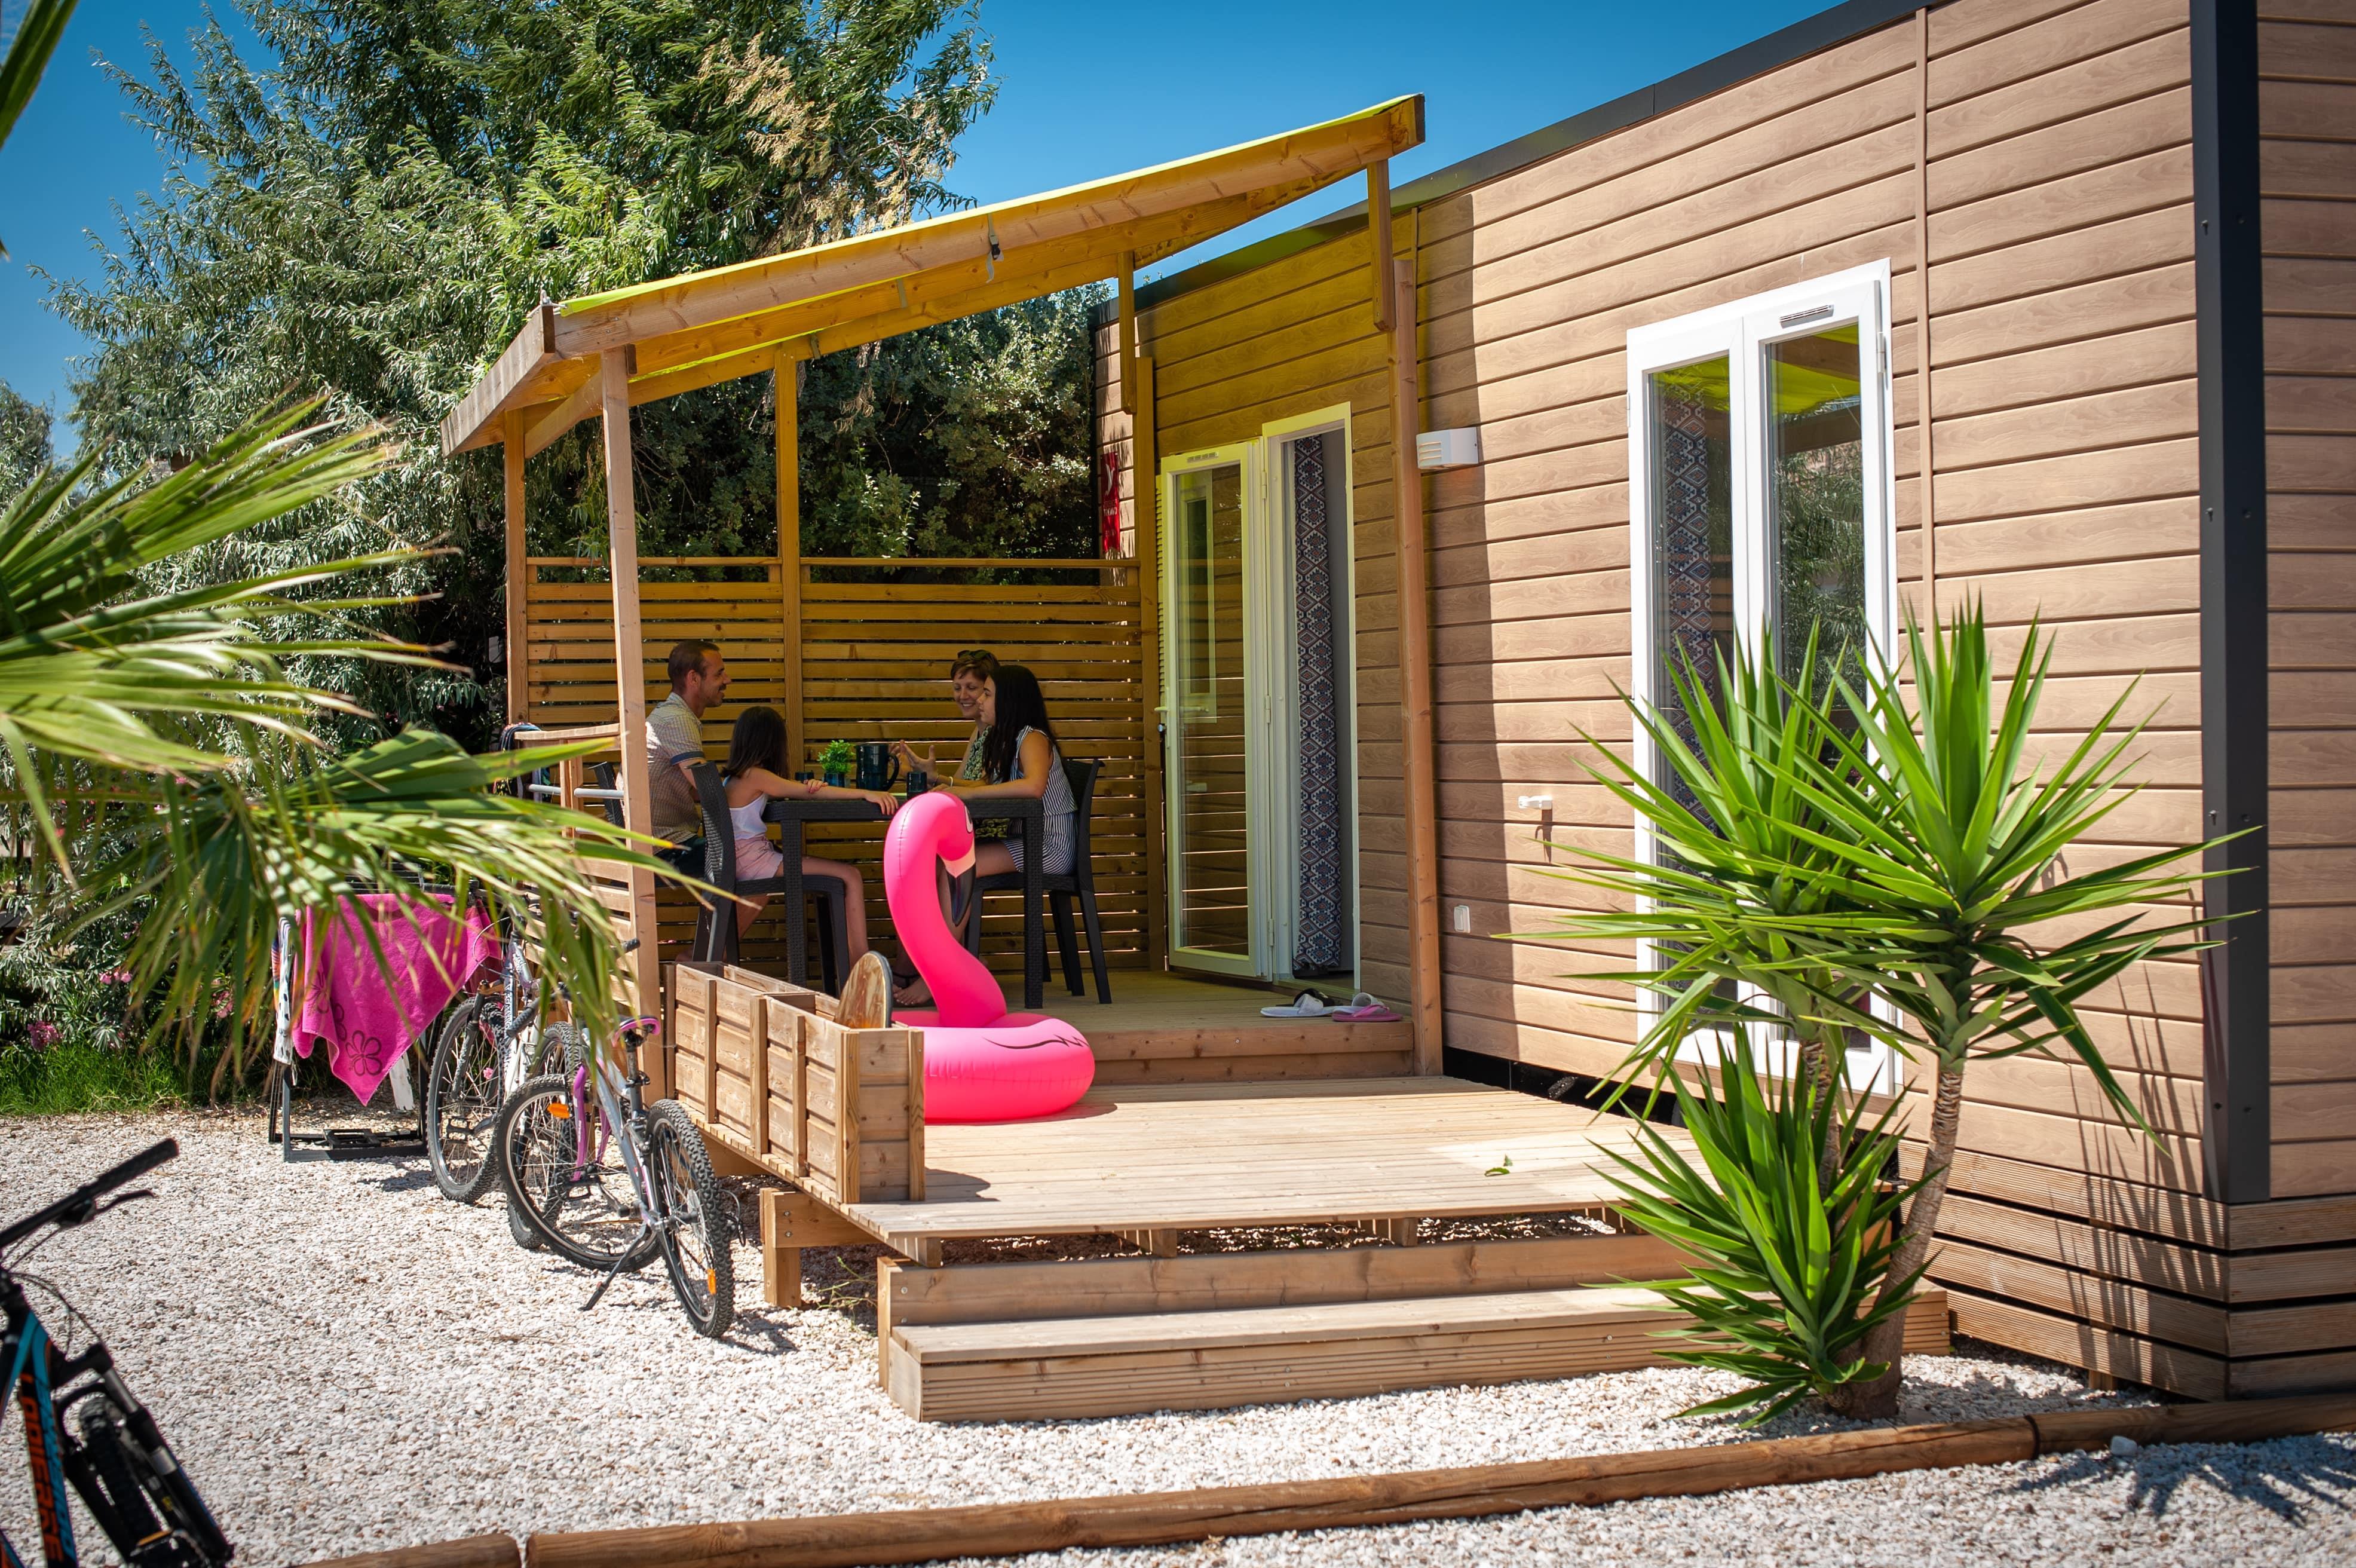 Camping Soleil d'Oc, Narbonne-Plage, Aude